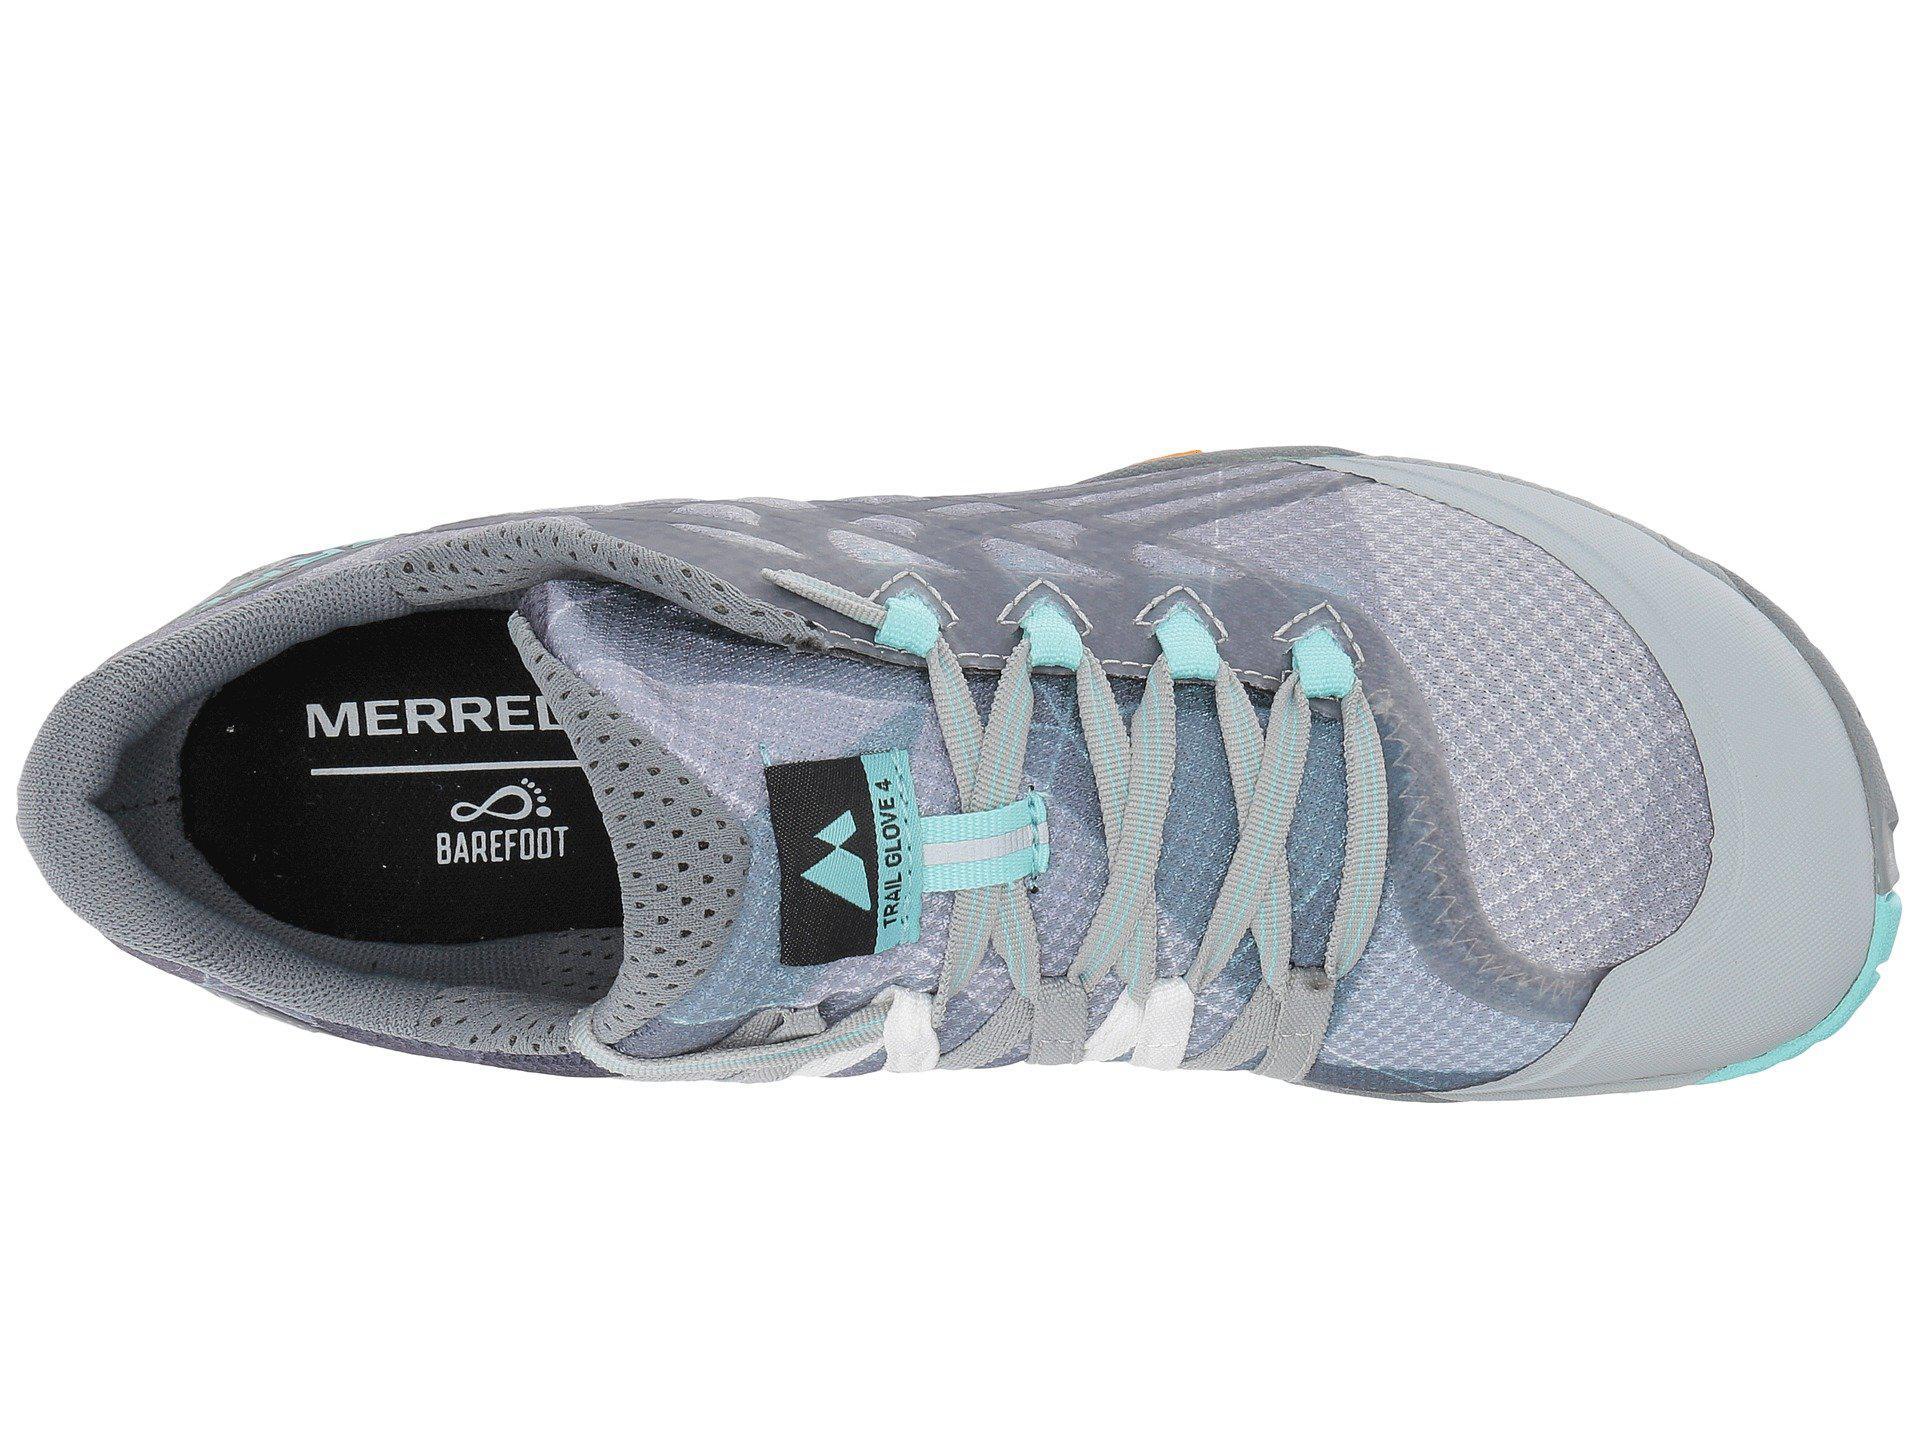 detailed look ba605 37893 Women's Blue Glove 4 Trail Runner